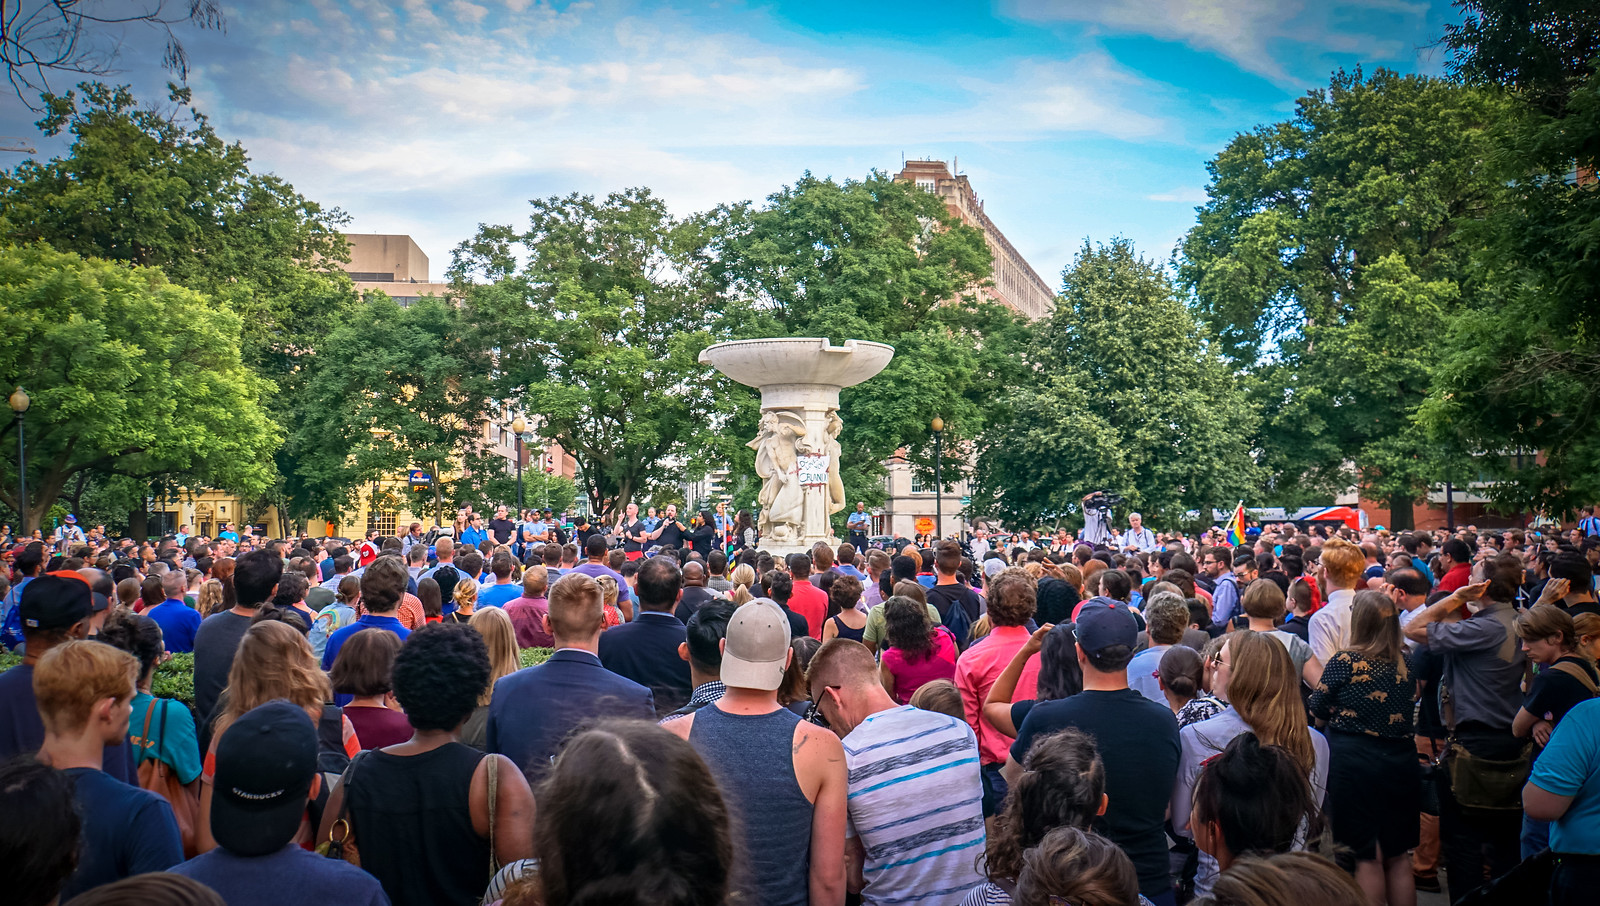 2016.06.13 From DC to Orlando Vigils 06103